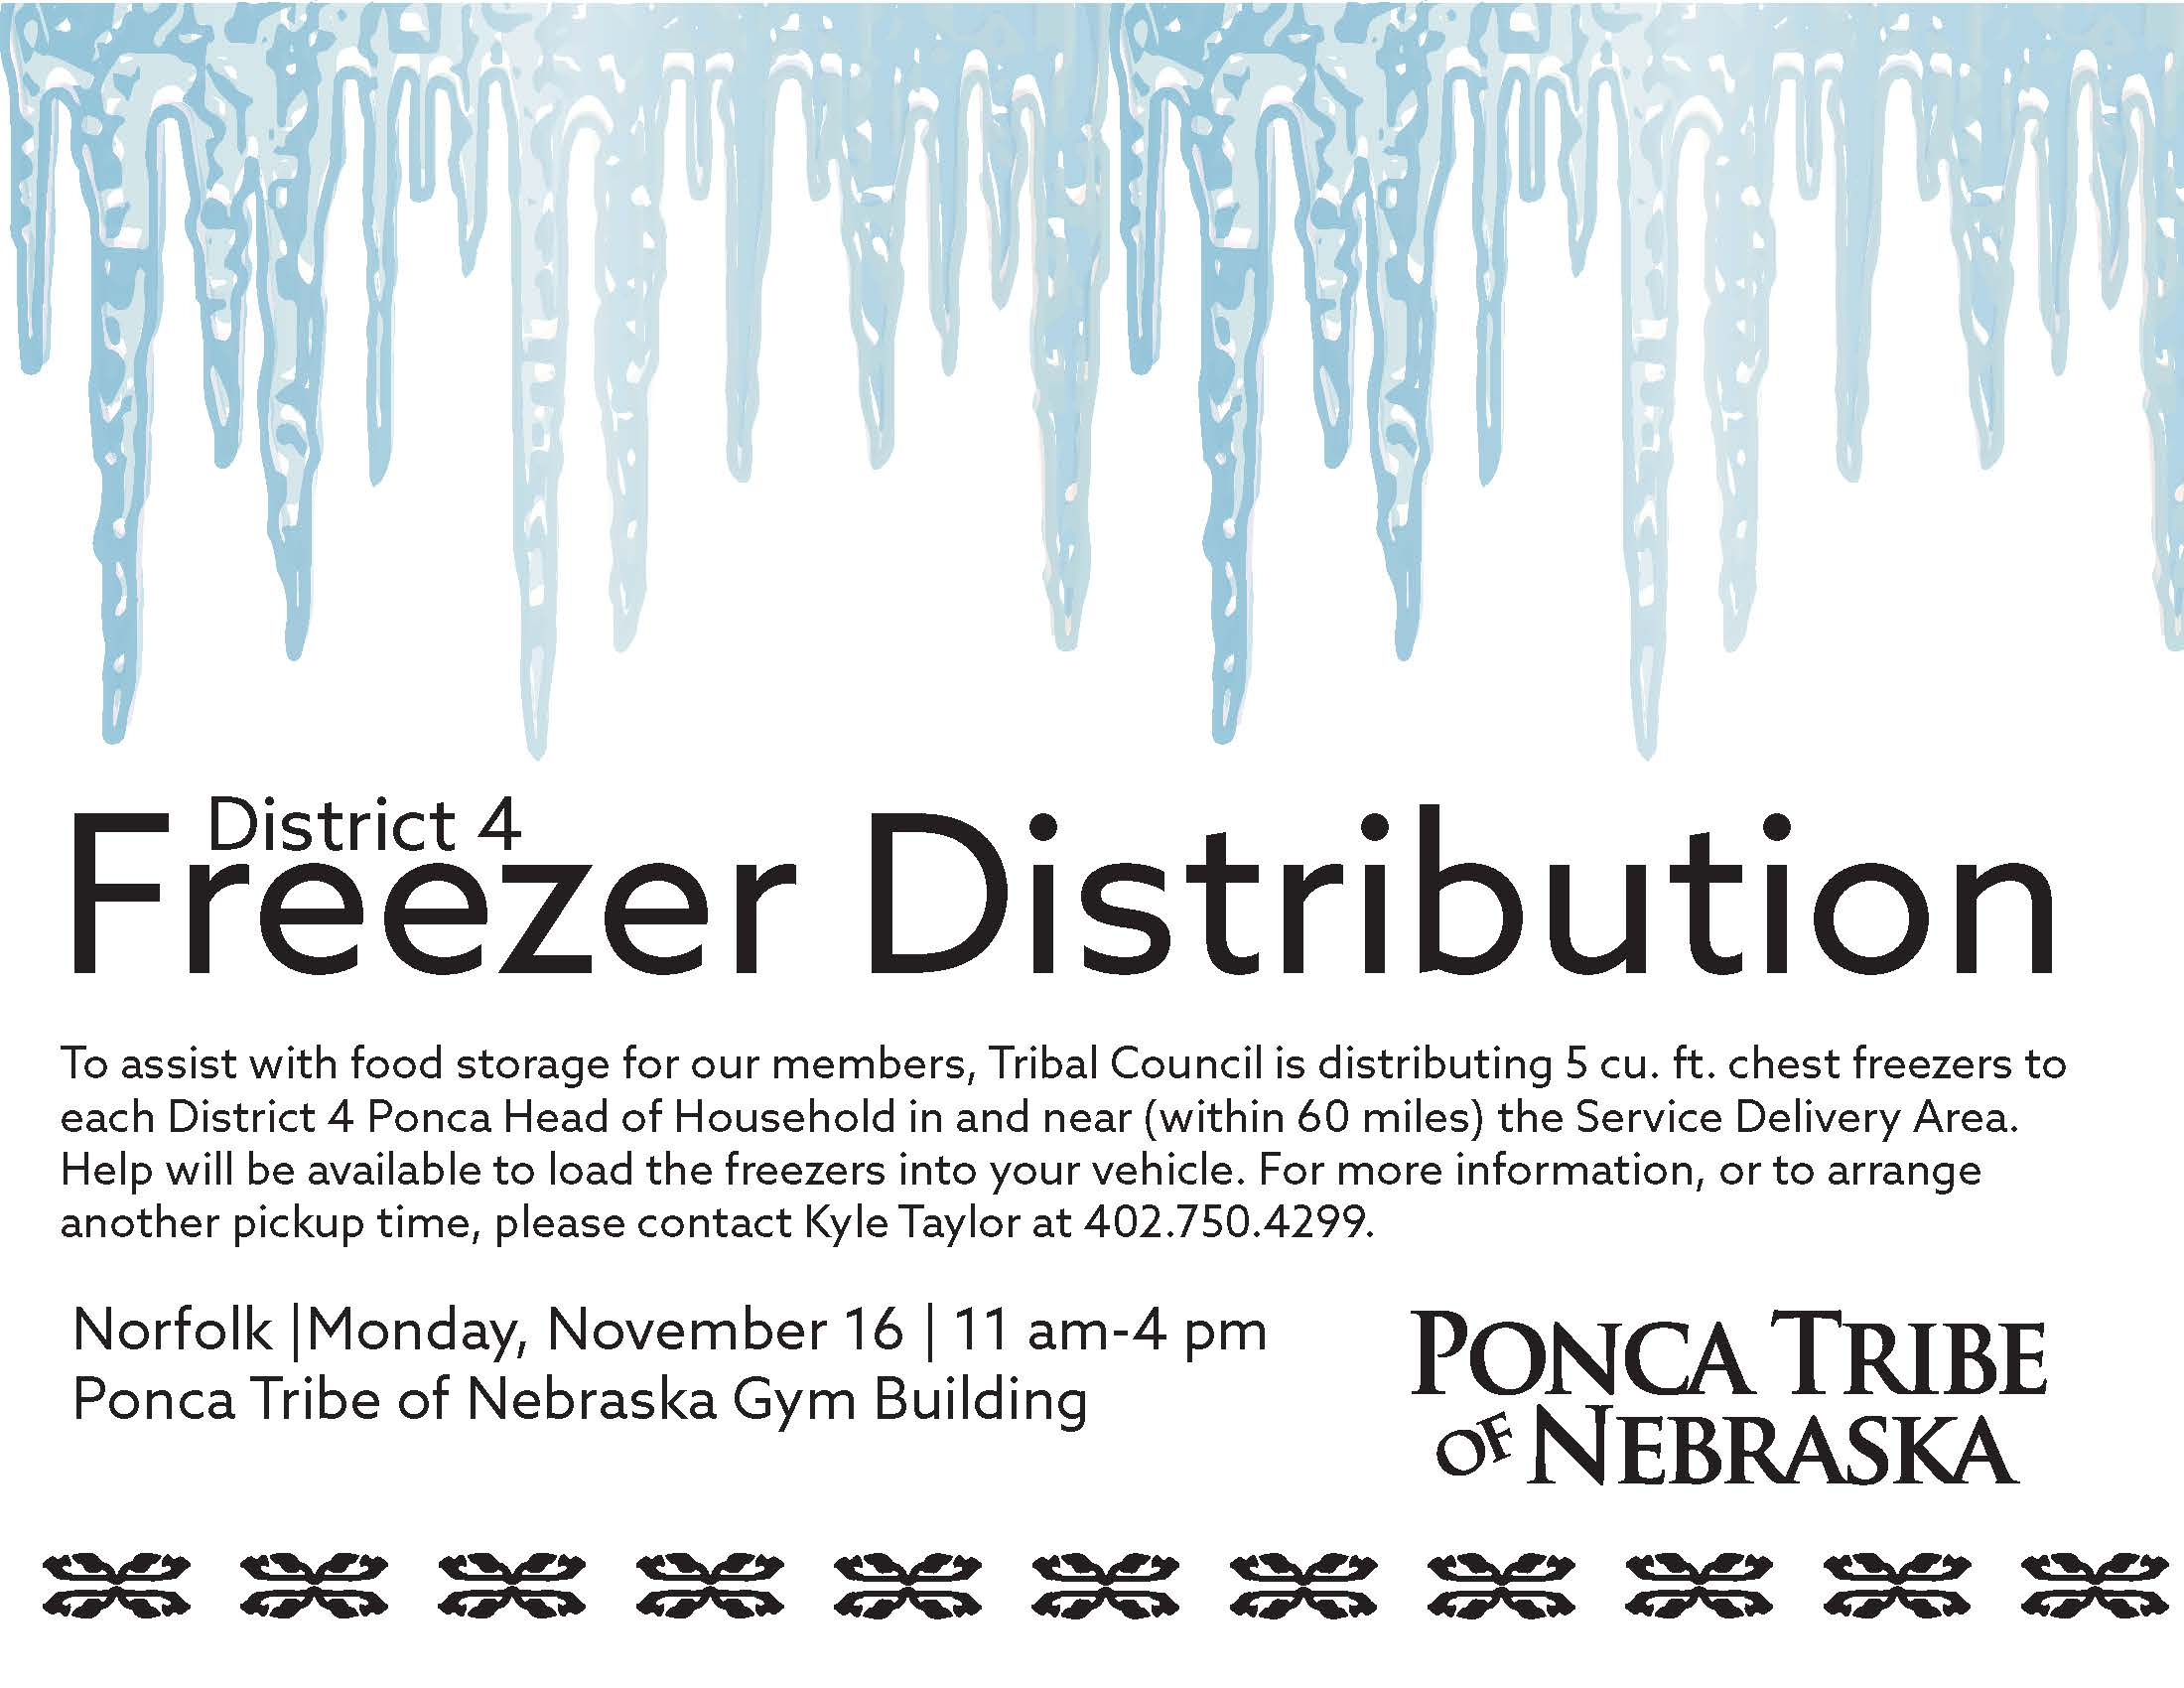 District 4 Freezer Distribution